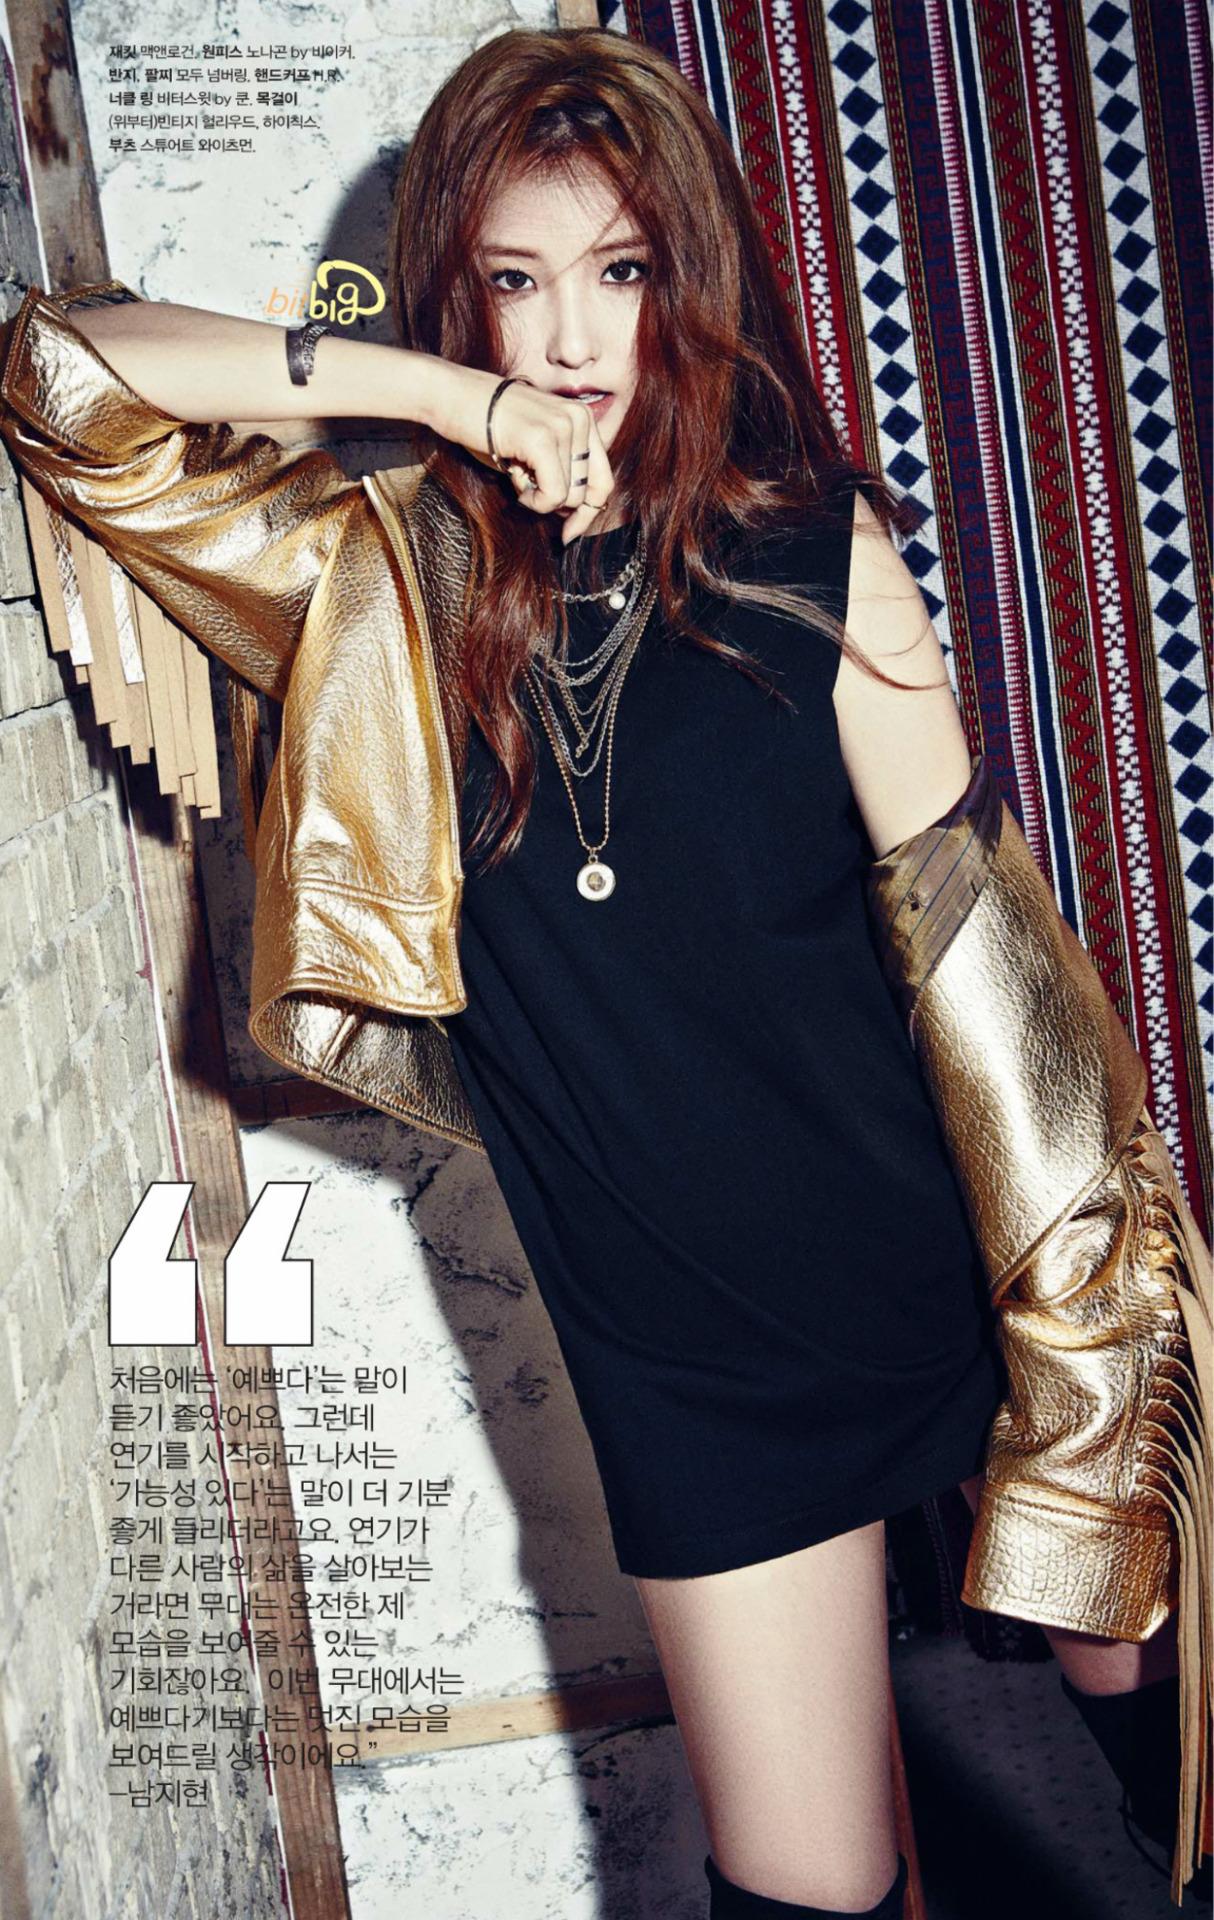 4Minute - Cosmopolitan Magazine March Issue '15